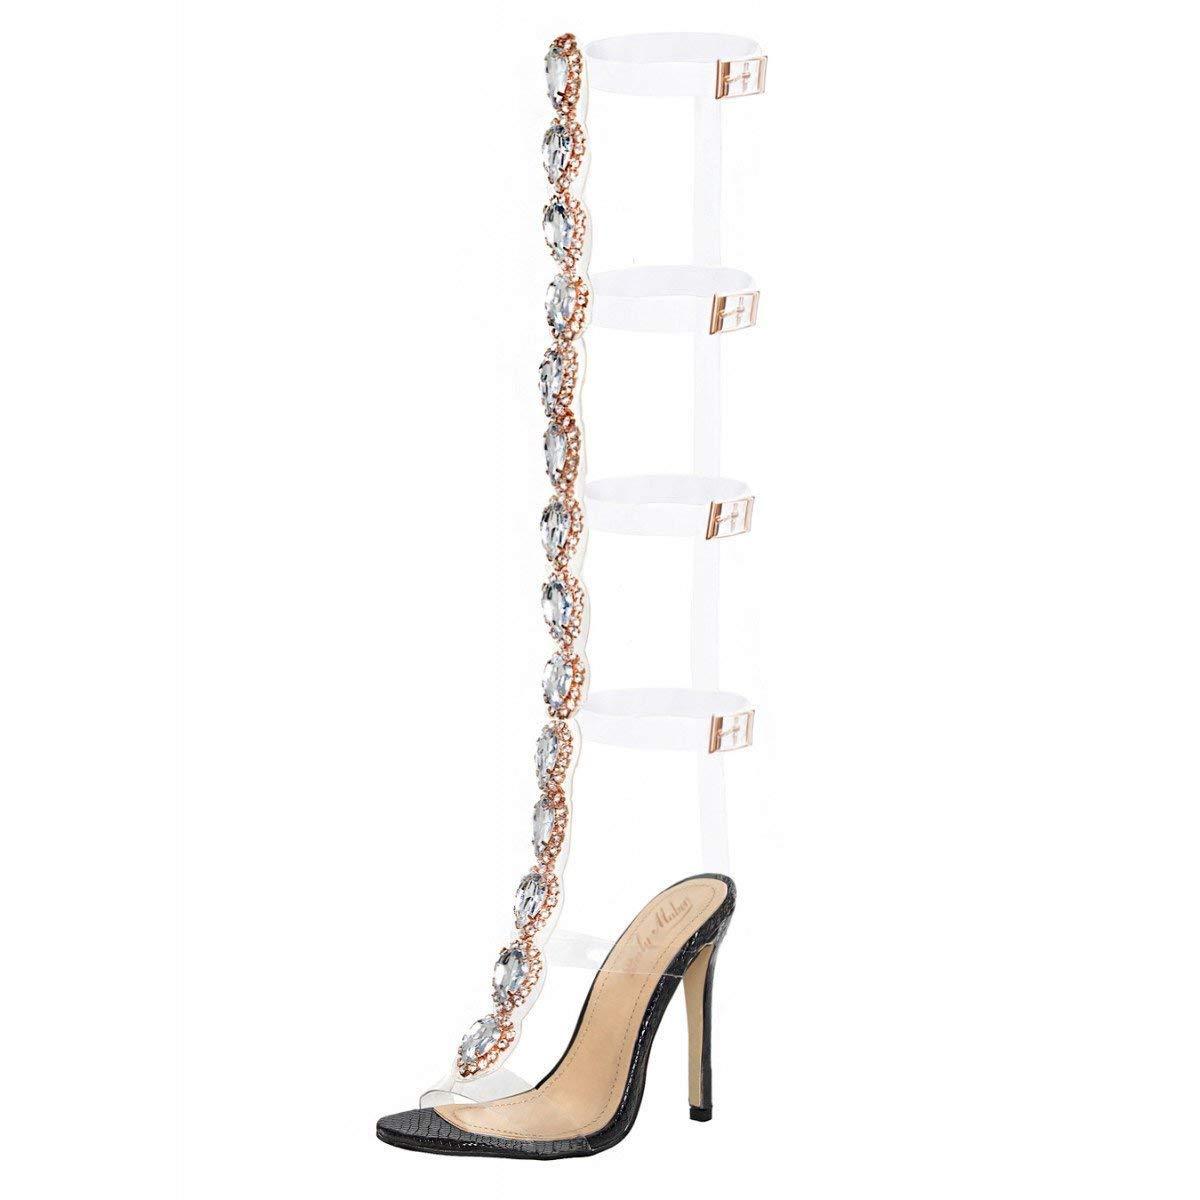 Unique Faux Gemstone Transparent 4-Buckle Strap Gladiator High-Heel Black Sandals - DeluxeAdultCostumes.com